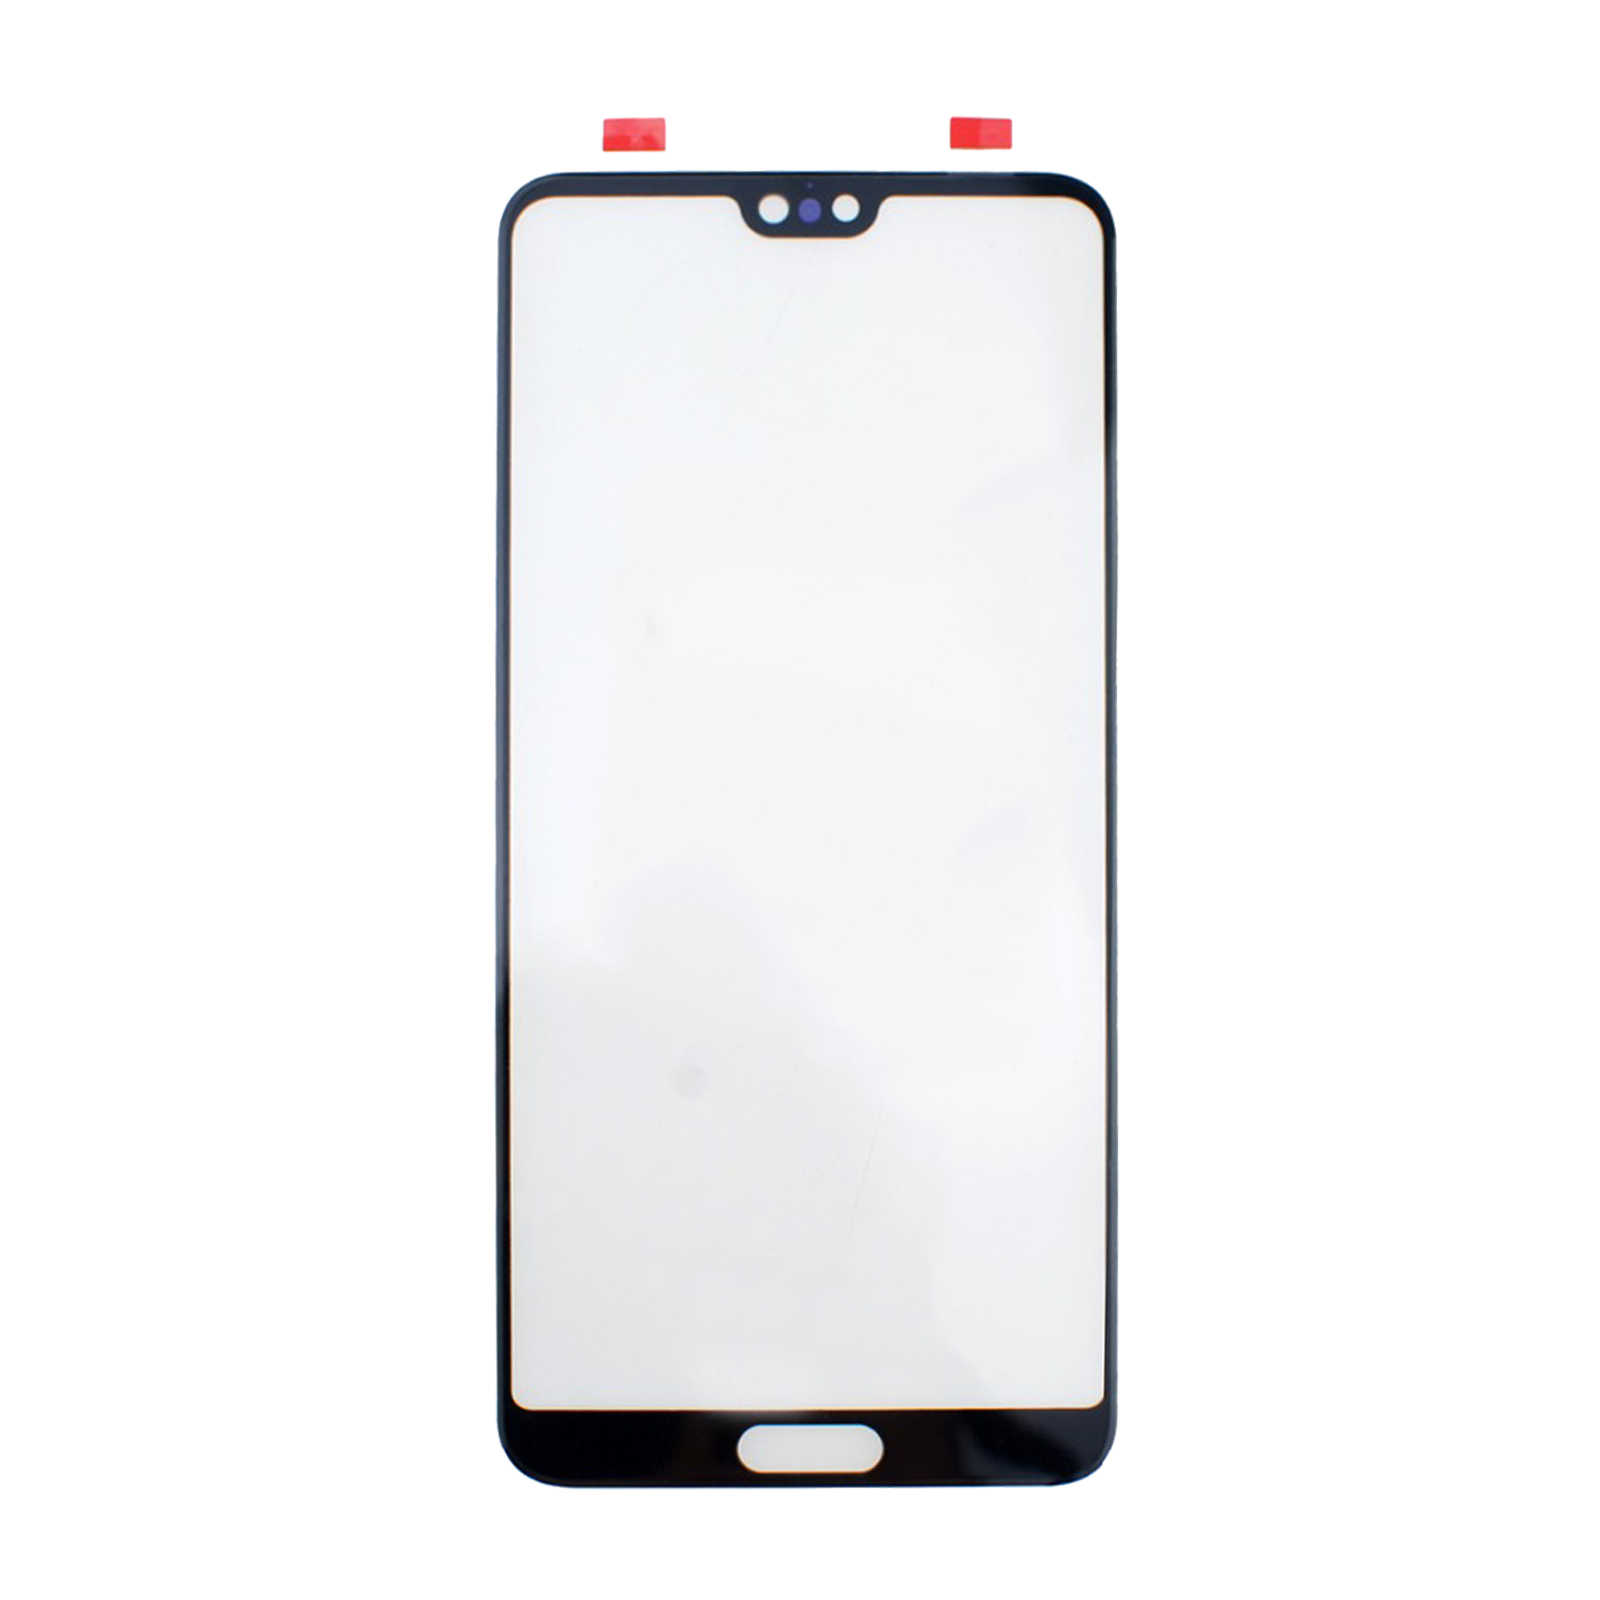 Shyueda Huawei 社 P20 プロ CLT-AL00 CLT-L09 CLT-L29 外側フロントスクリーンガラス交換部品